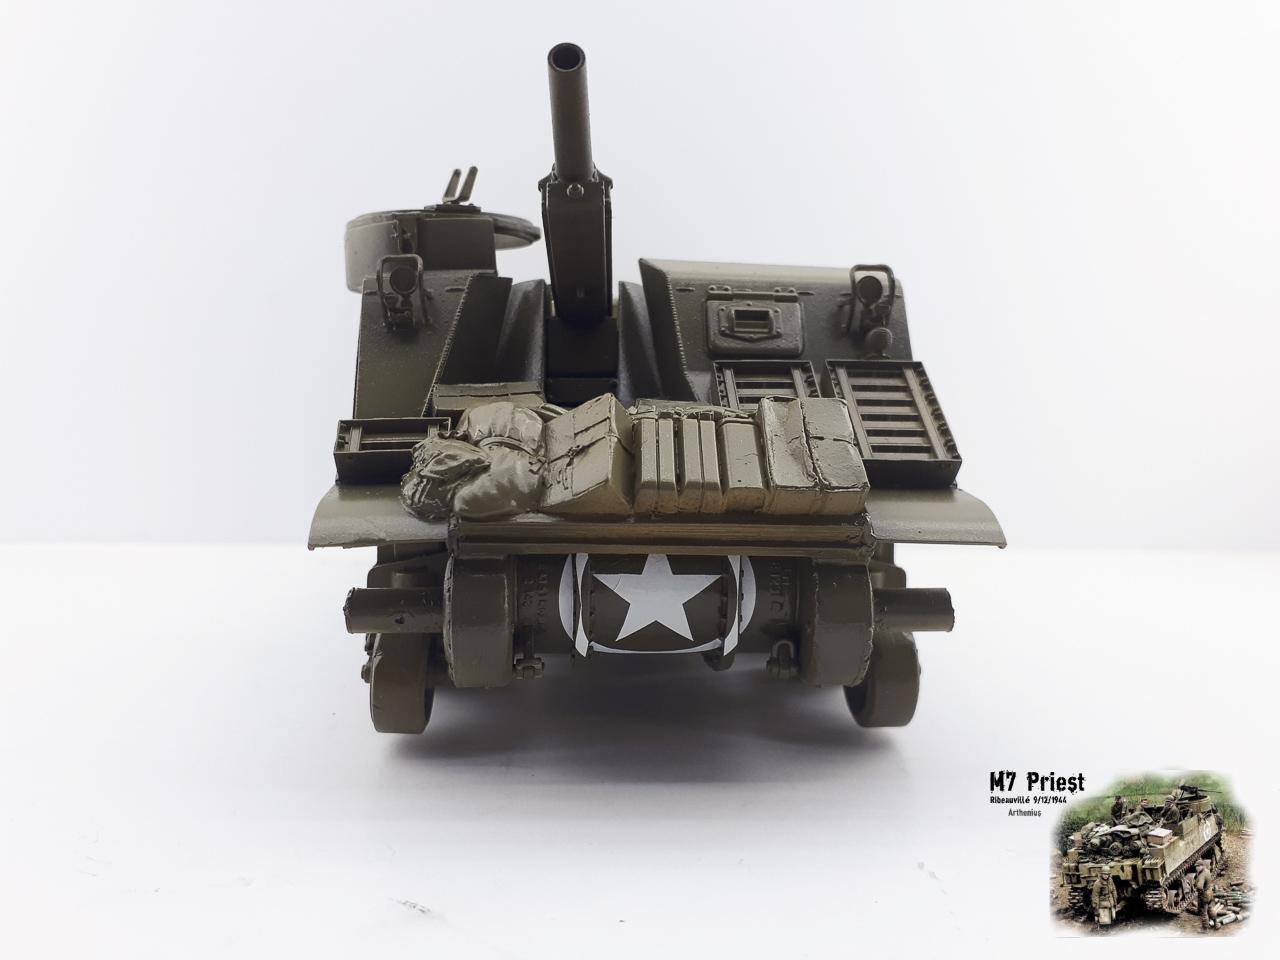 M7 Priest Ribeauvillé 9/12/1944 - Page 2 2018-087